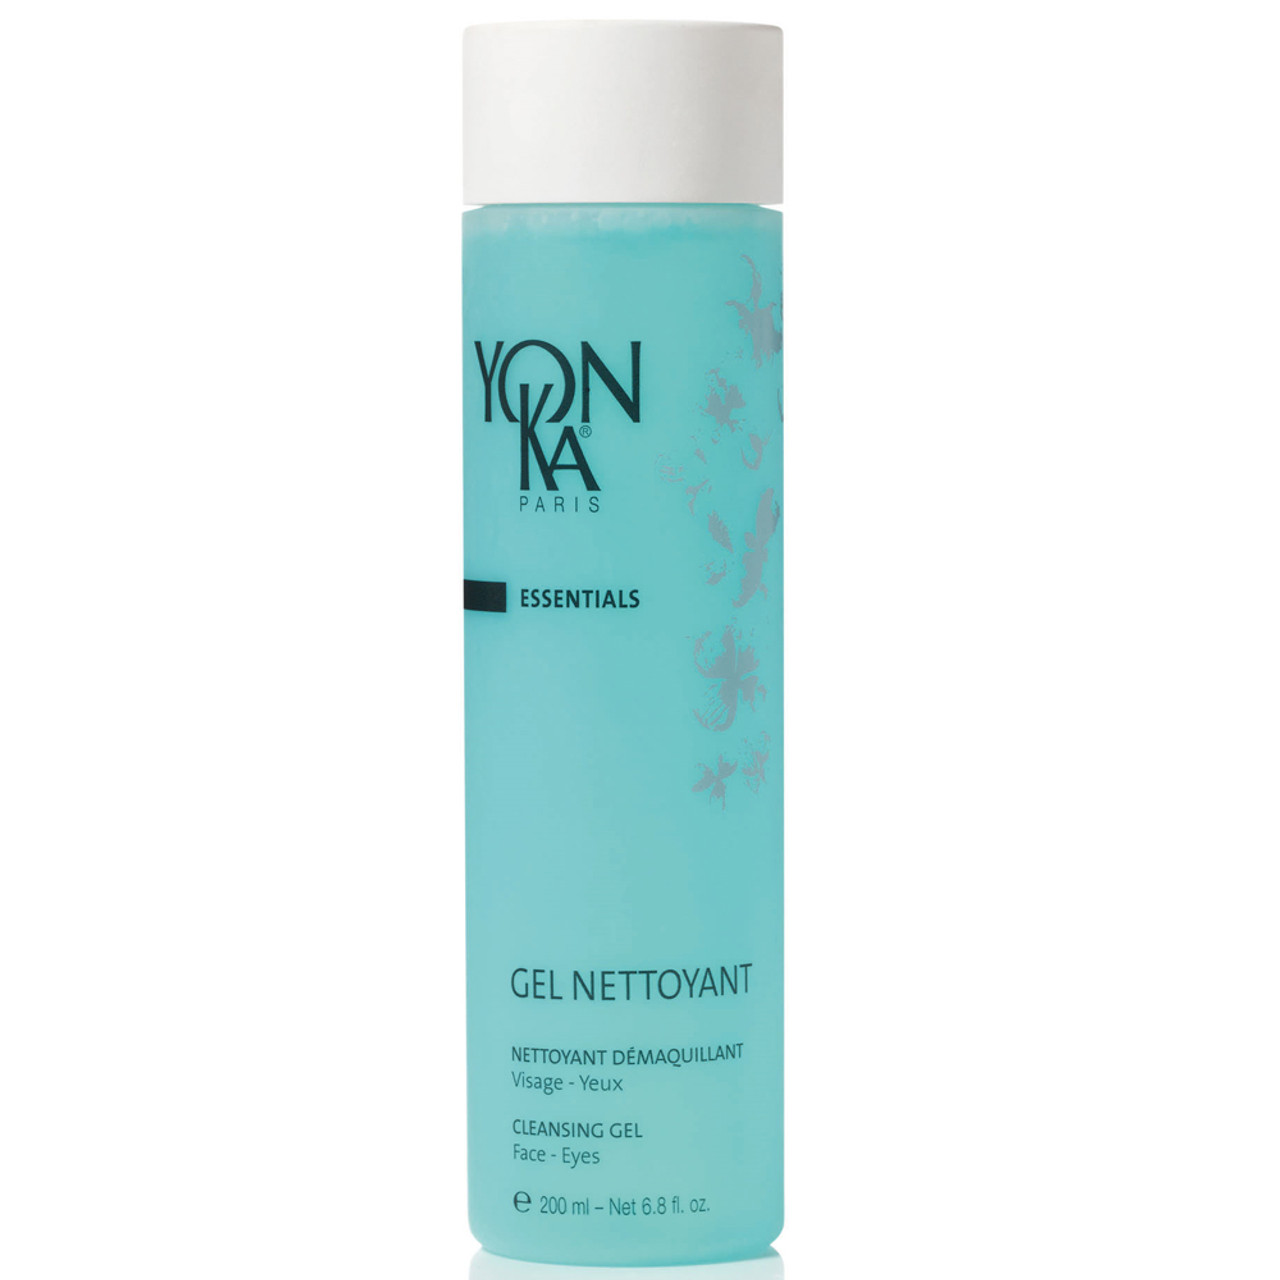 YonKa Gel Nettoyant Cleansing Gel BeautifiedYou.com